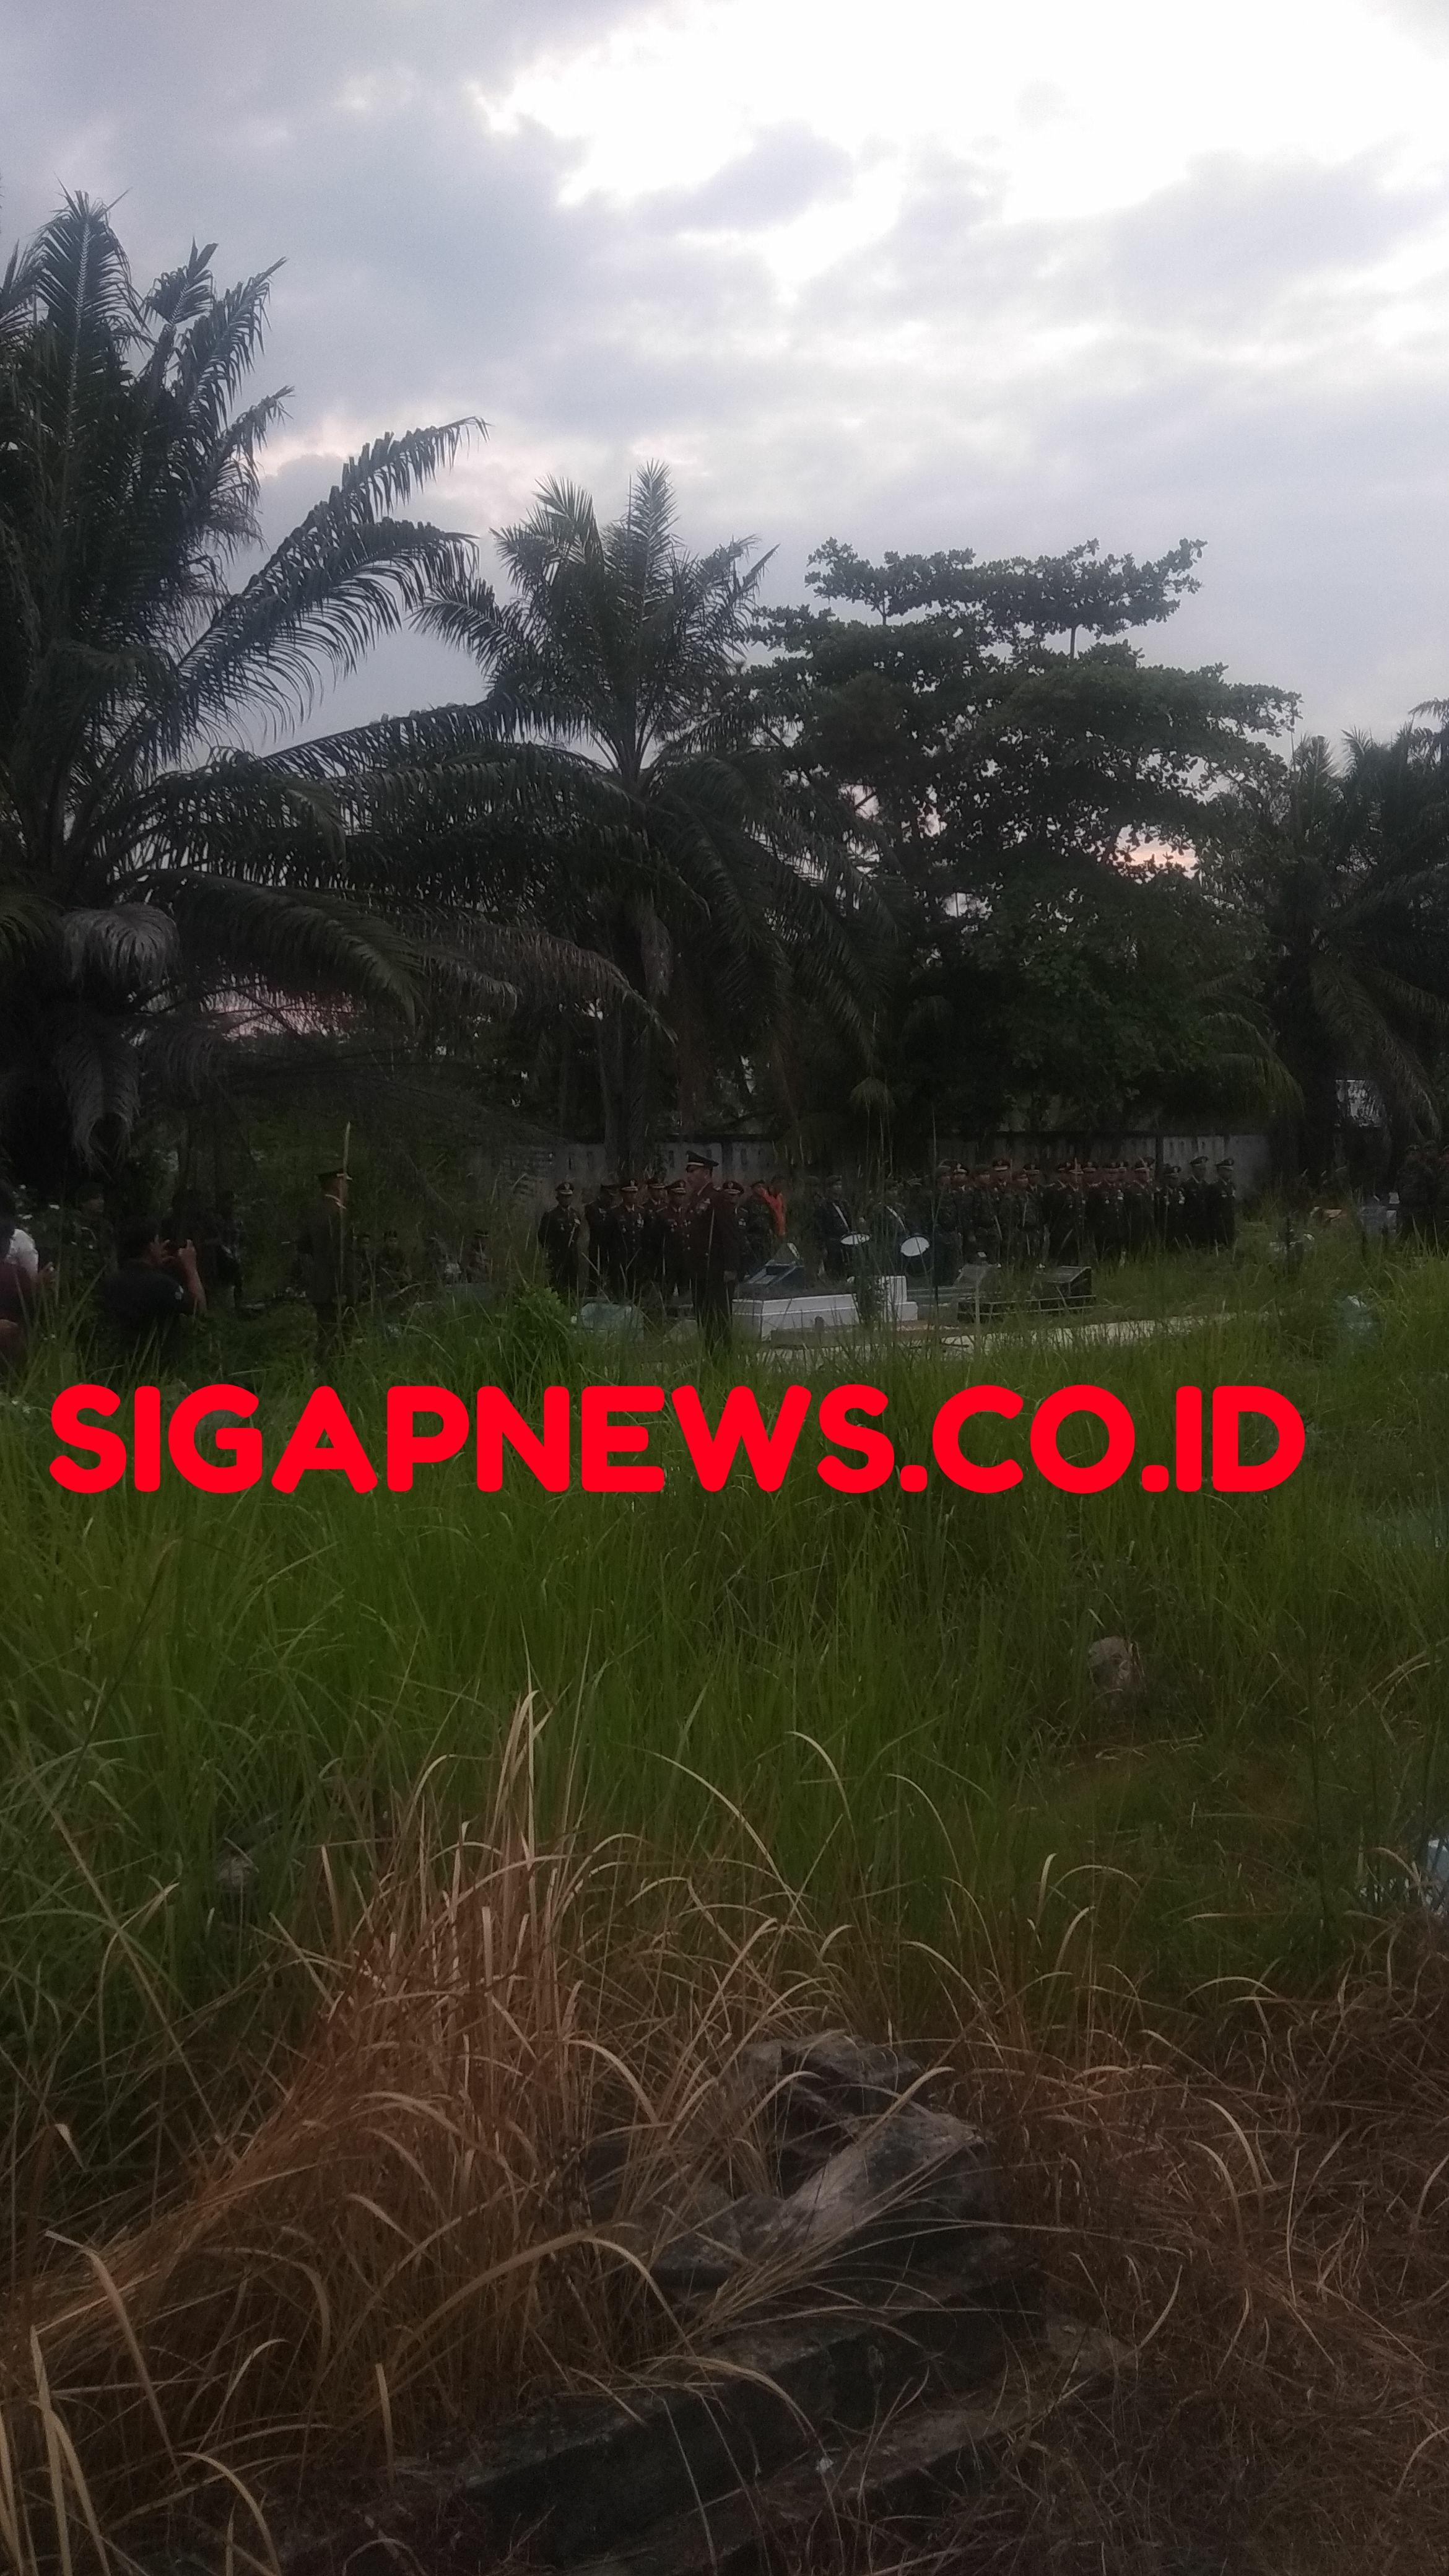 Danrem 031/Wirabima Brigjend TNI Muhammad Fajar Pimpin Upacara Militer Kapten Inf Sabar Riswanto